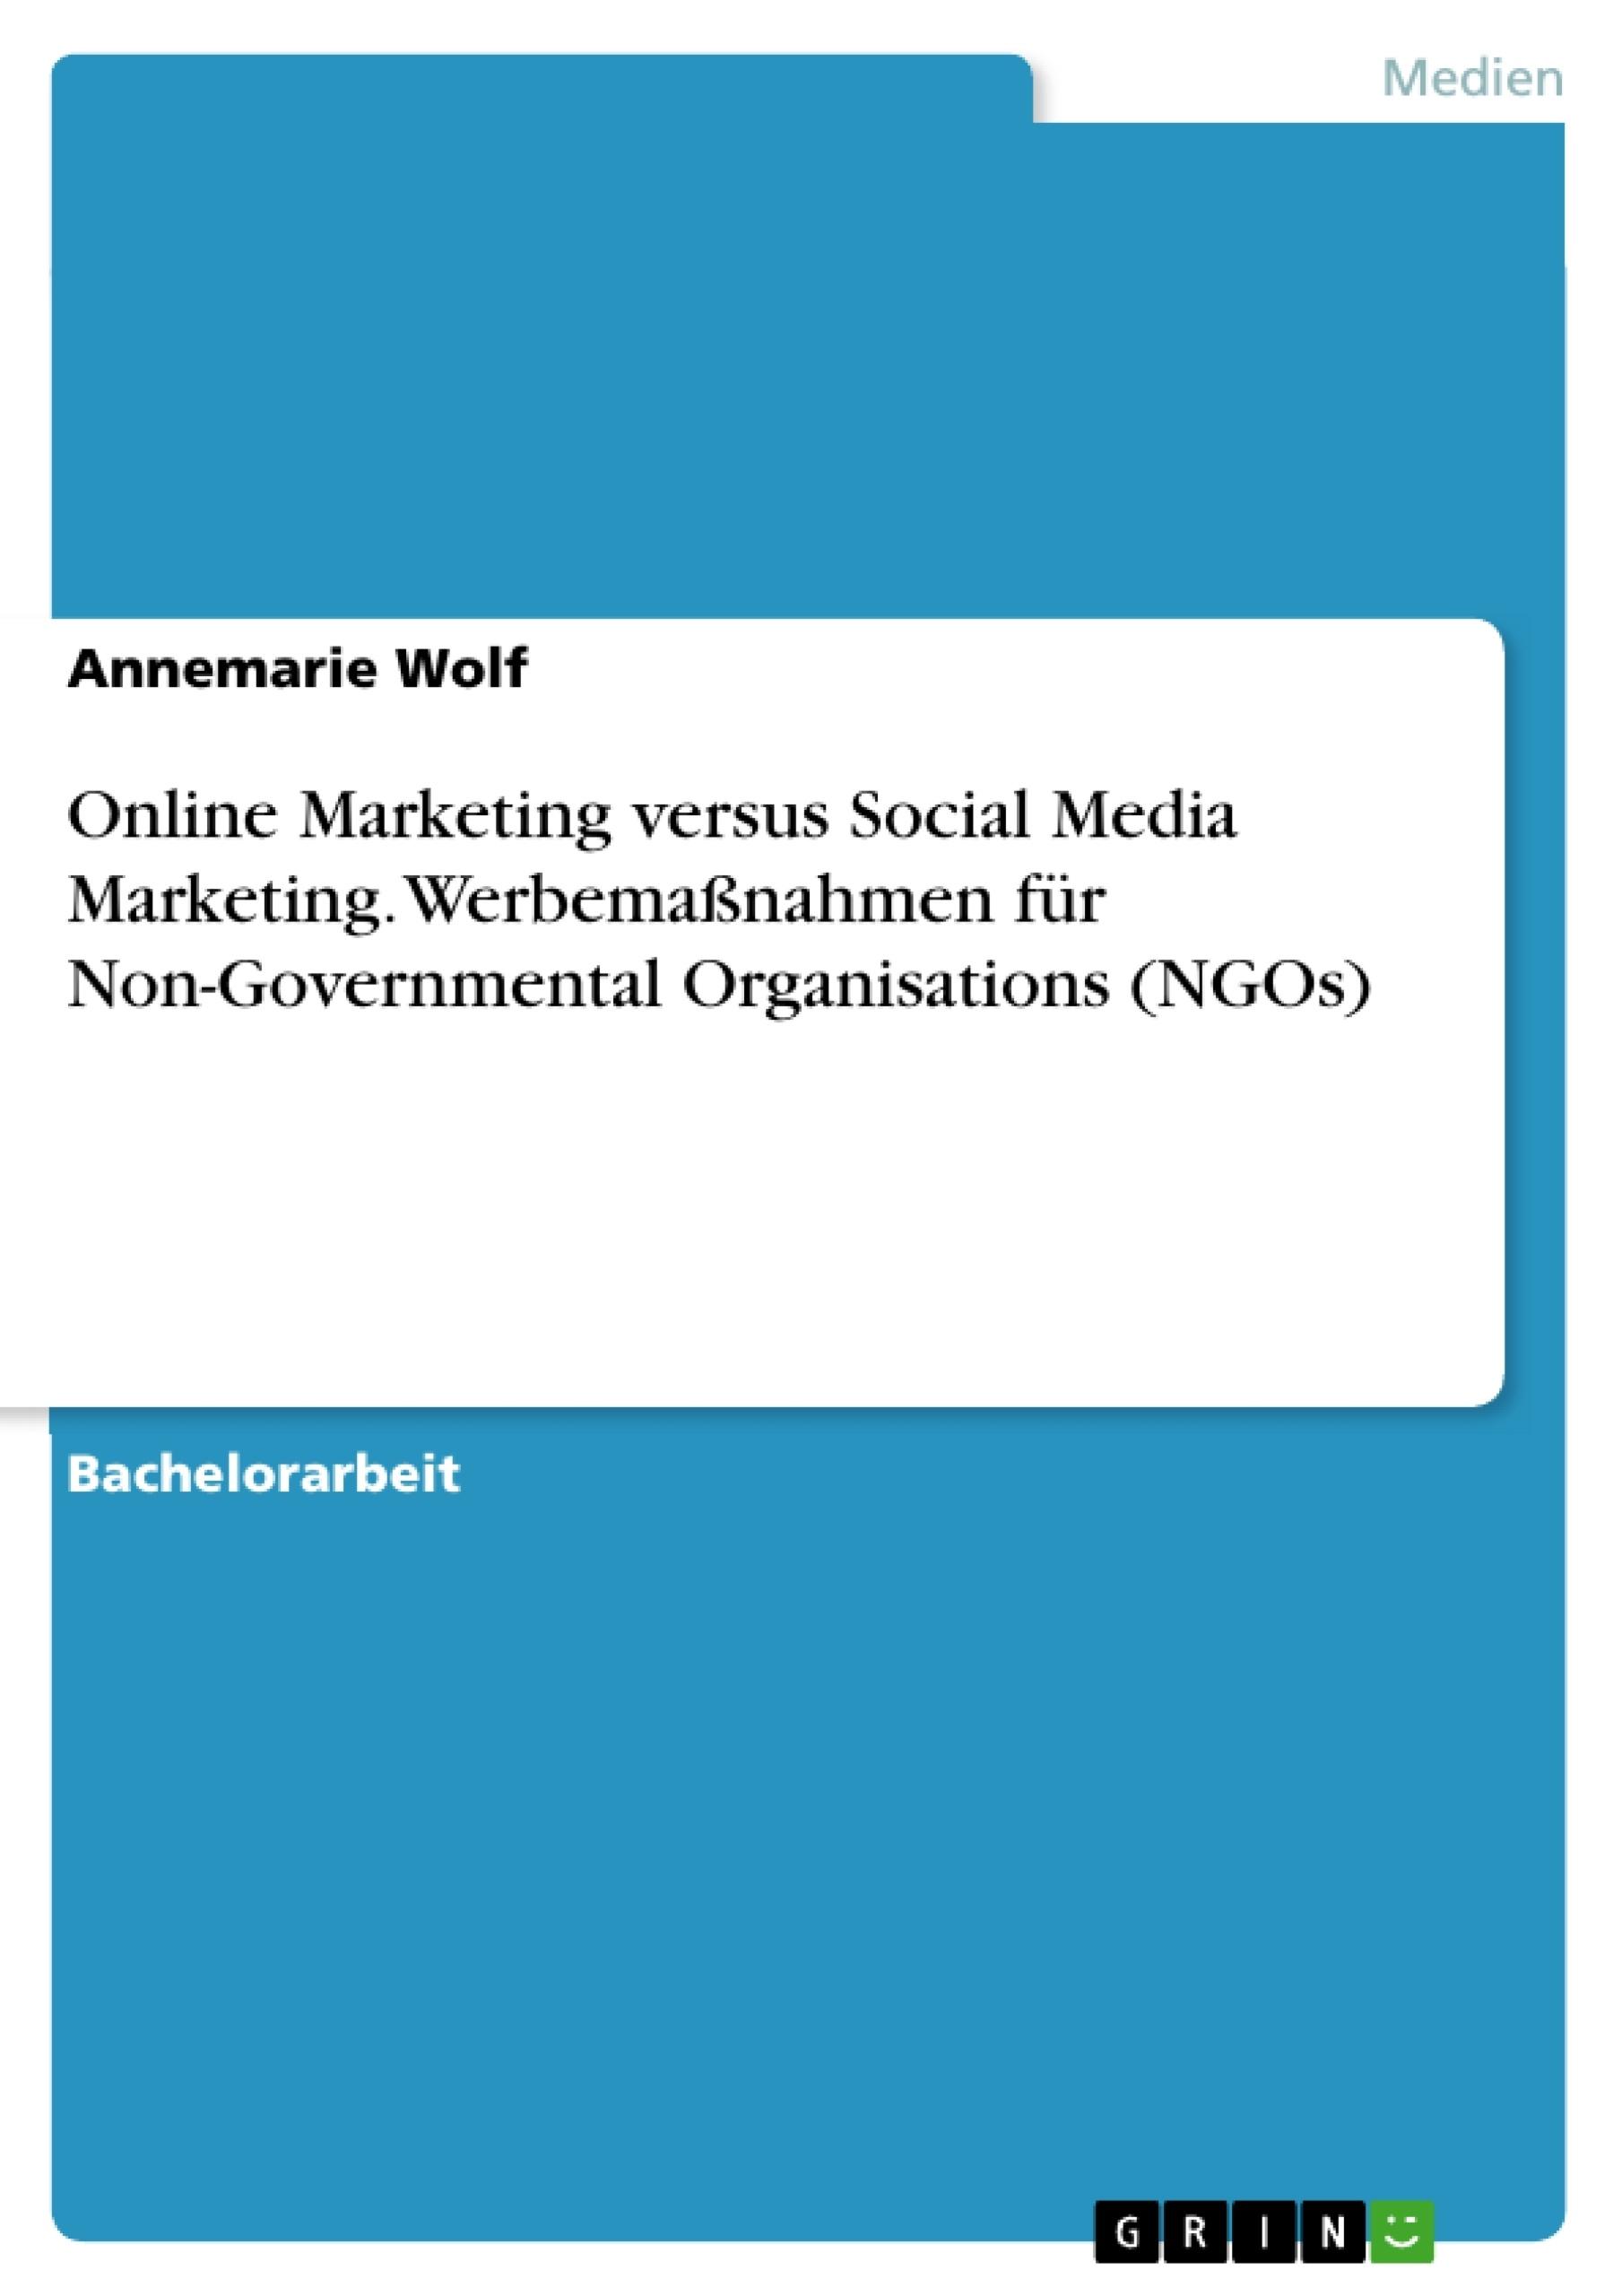 Titel: Online Marketing versus Social Media Marketing. Werbemaßnahmen für Non-Governmental Organisations (NGOs)